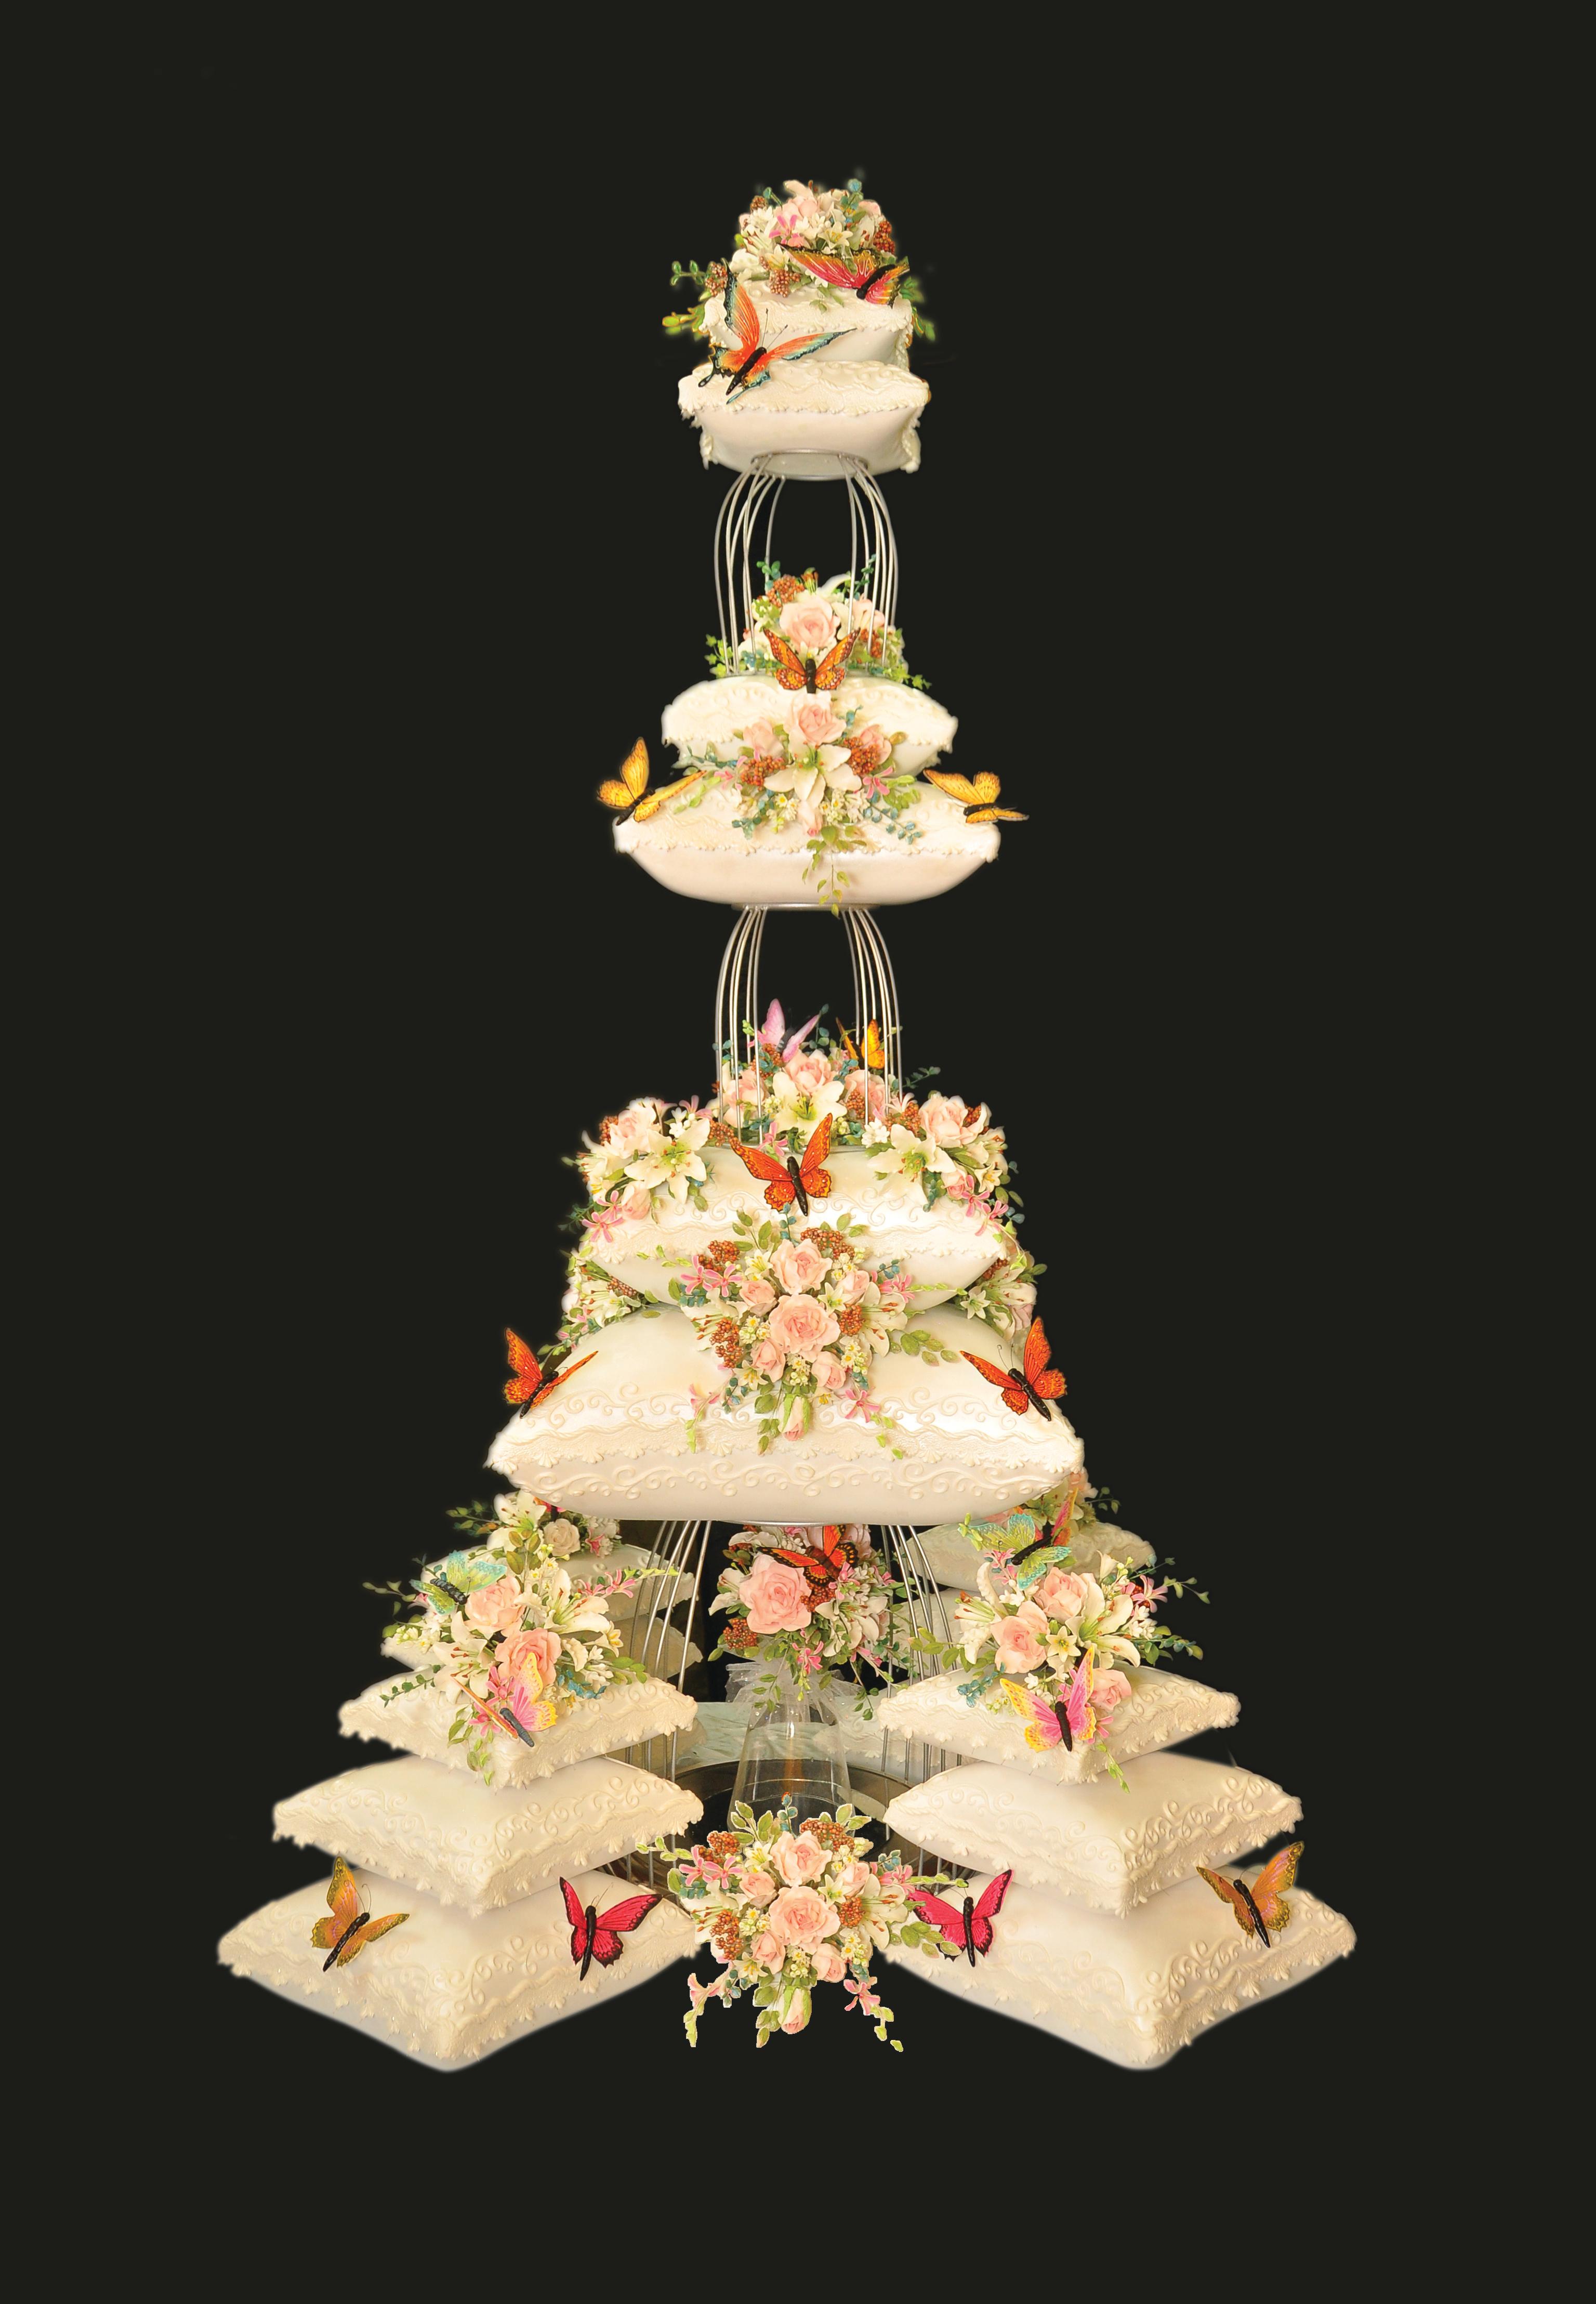 2012 malmee opening cake - Copy.jpg